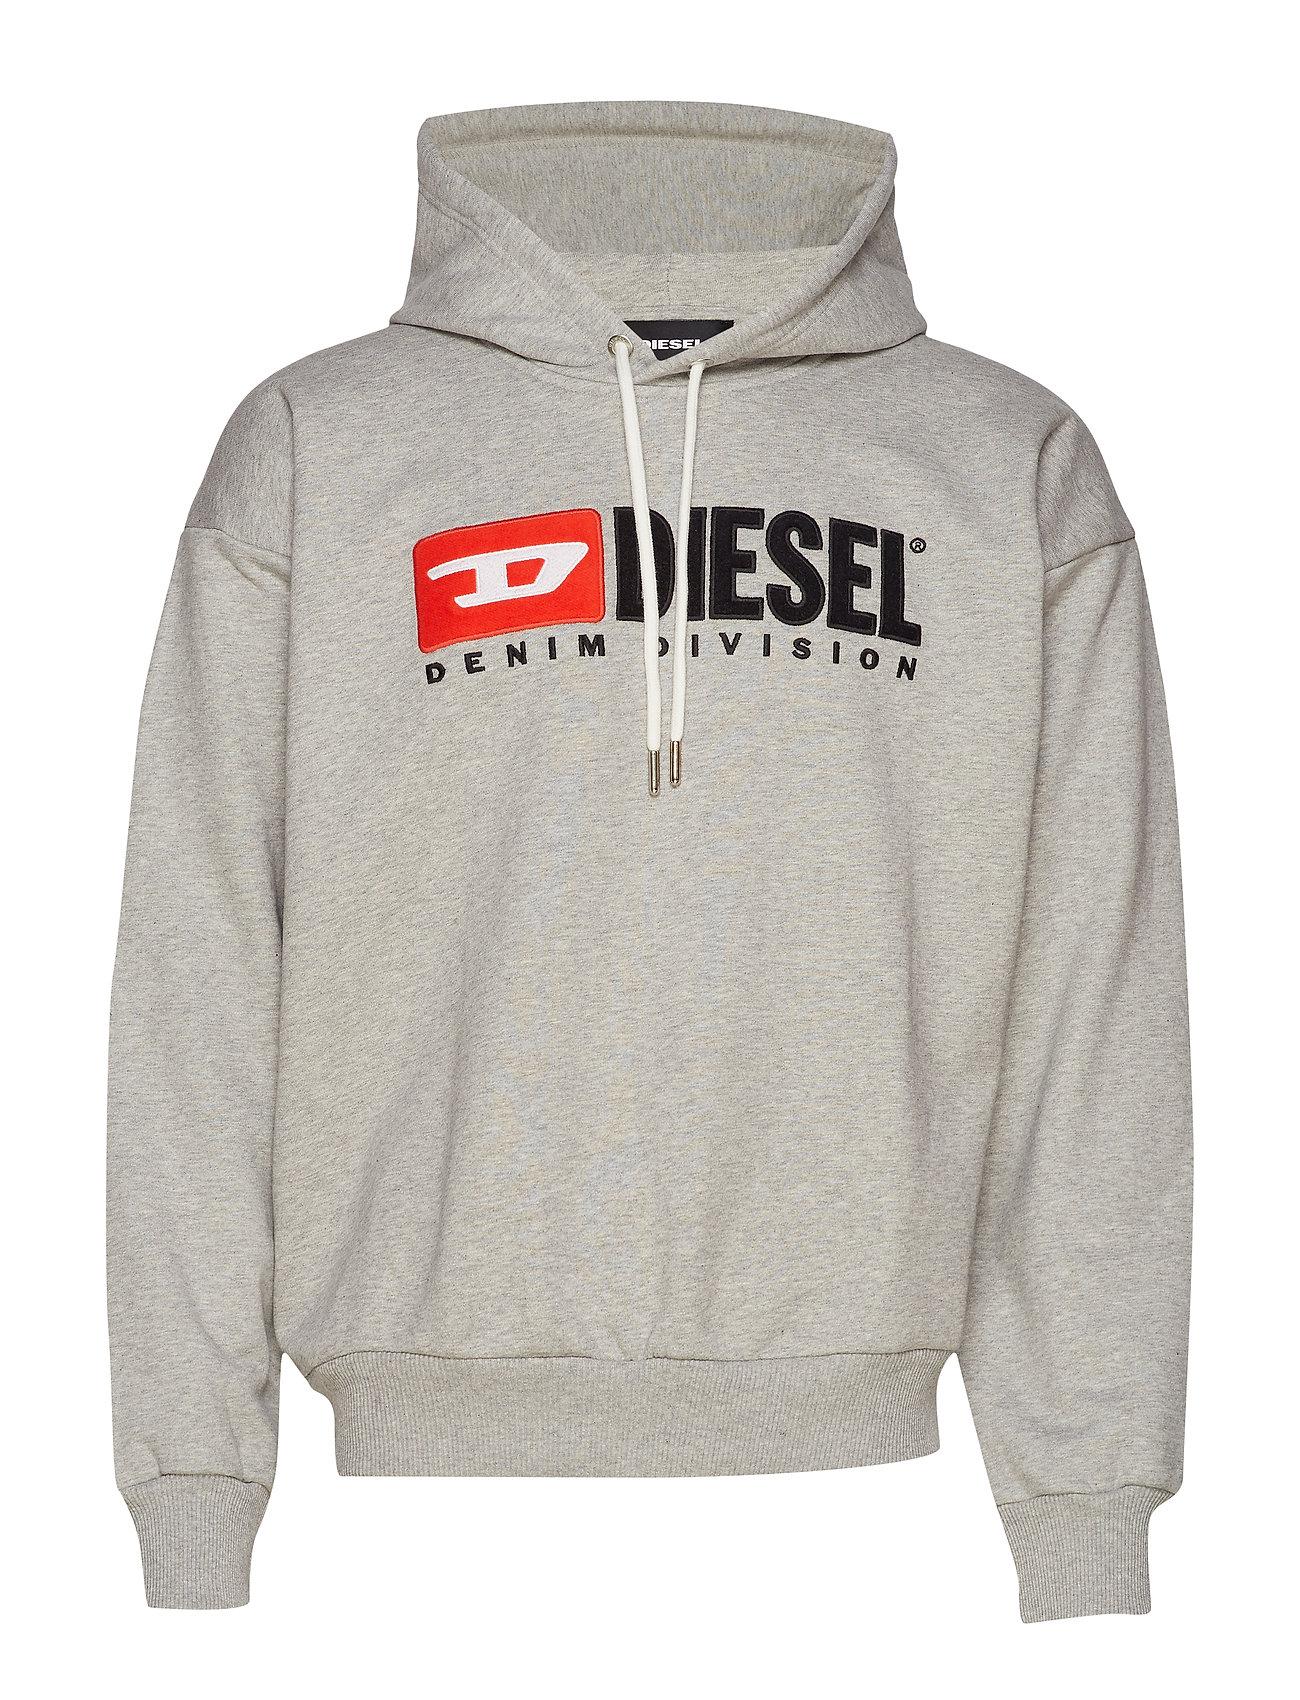 Diesel Men S-DIVISION SWEAT-SHIRT - LIGHT GREY MELANGE